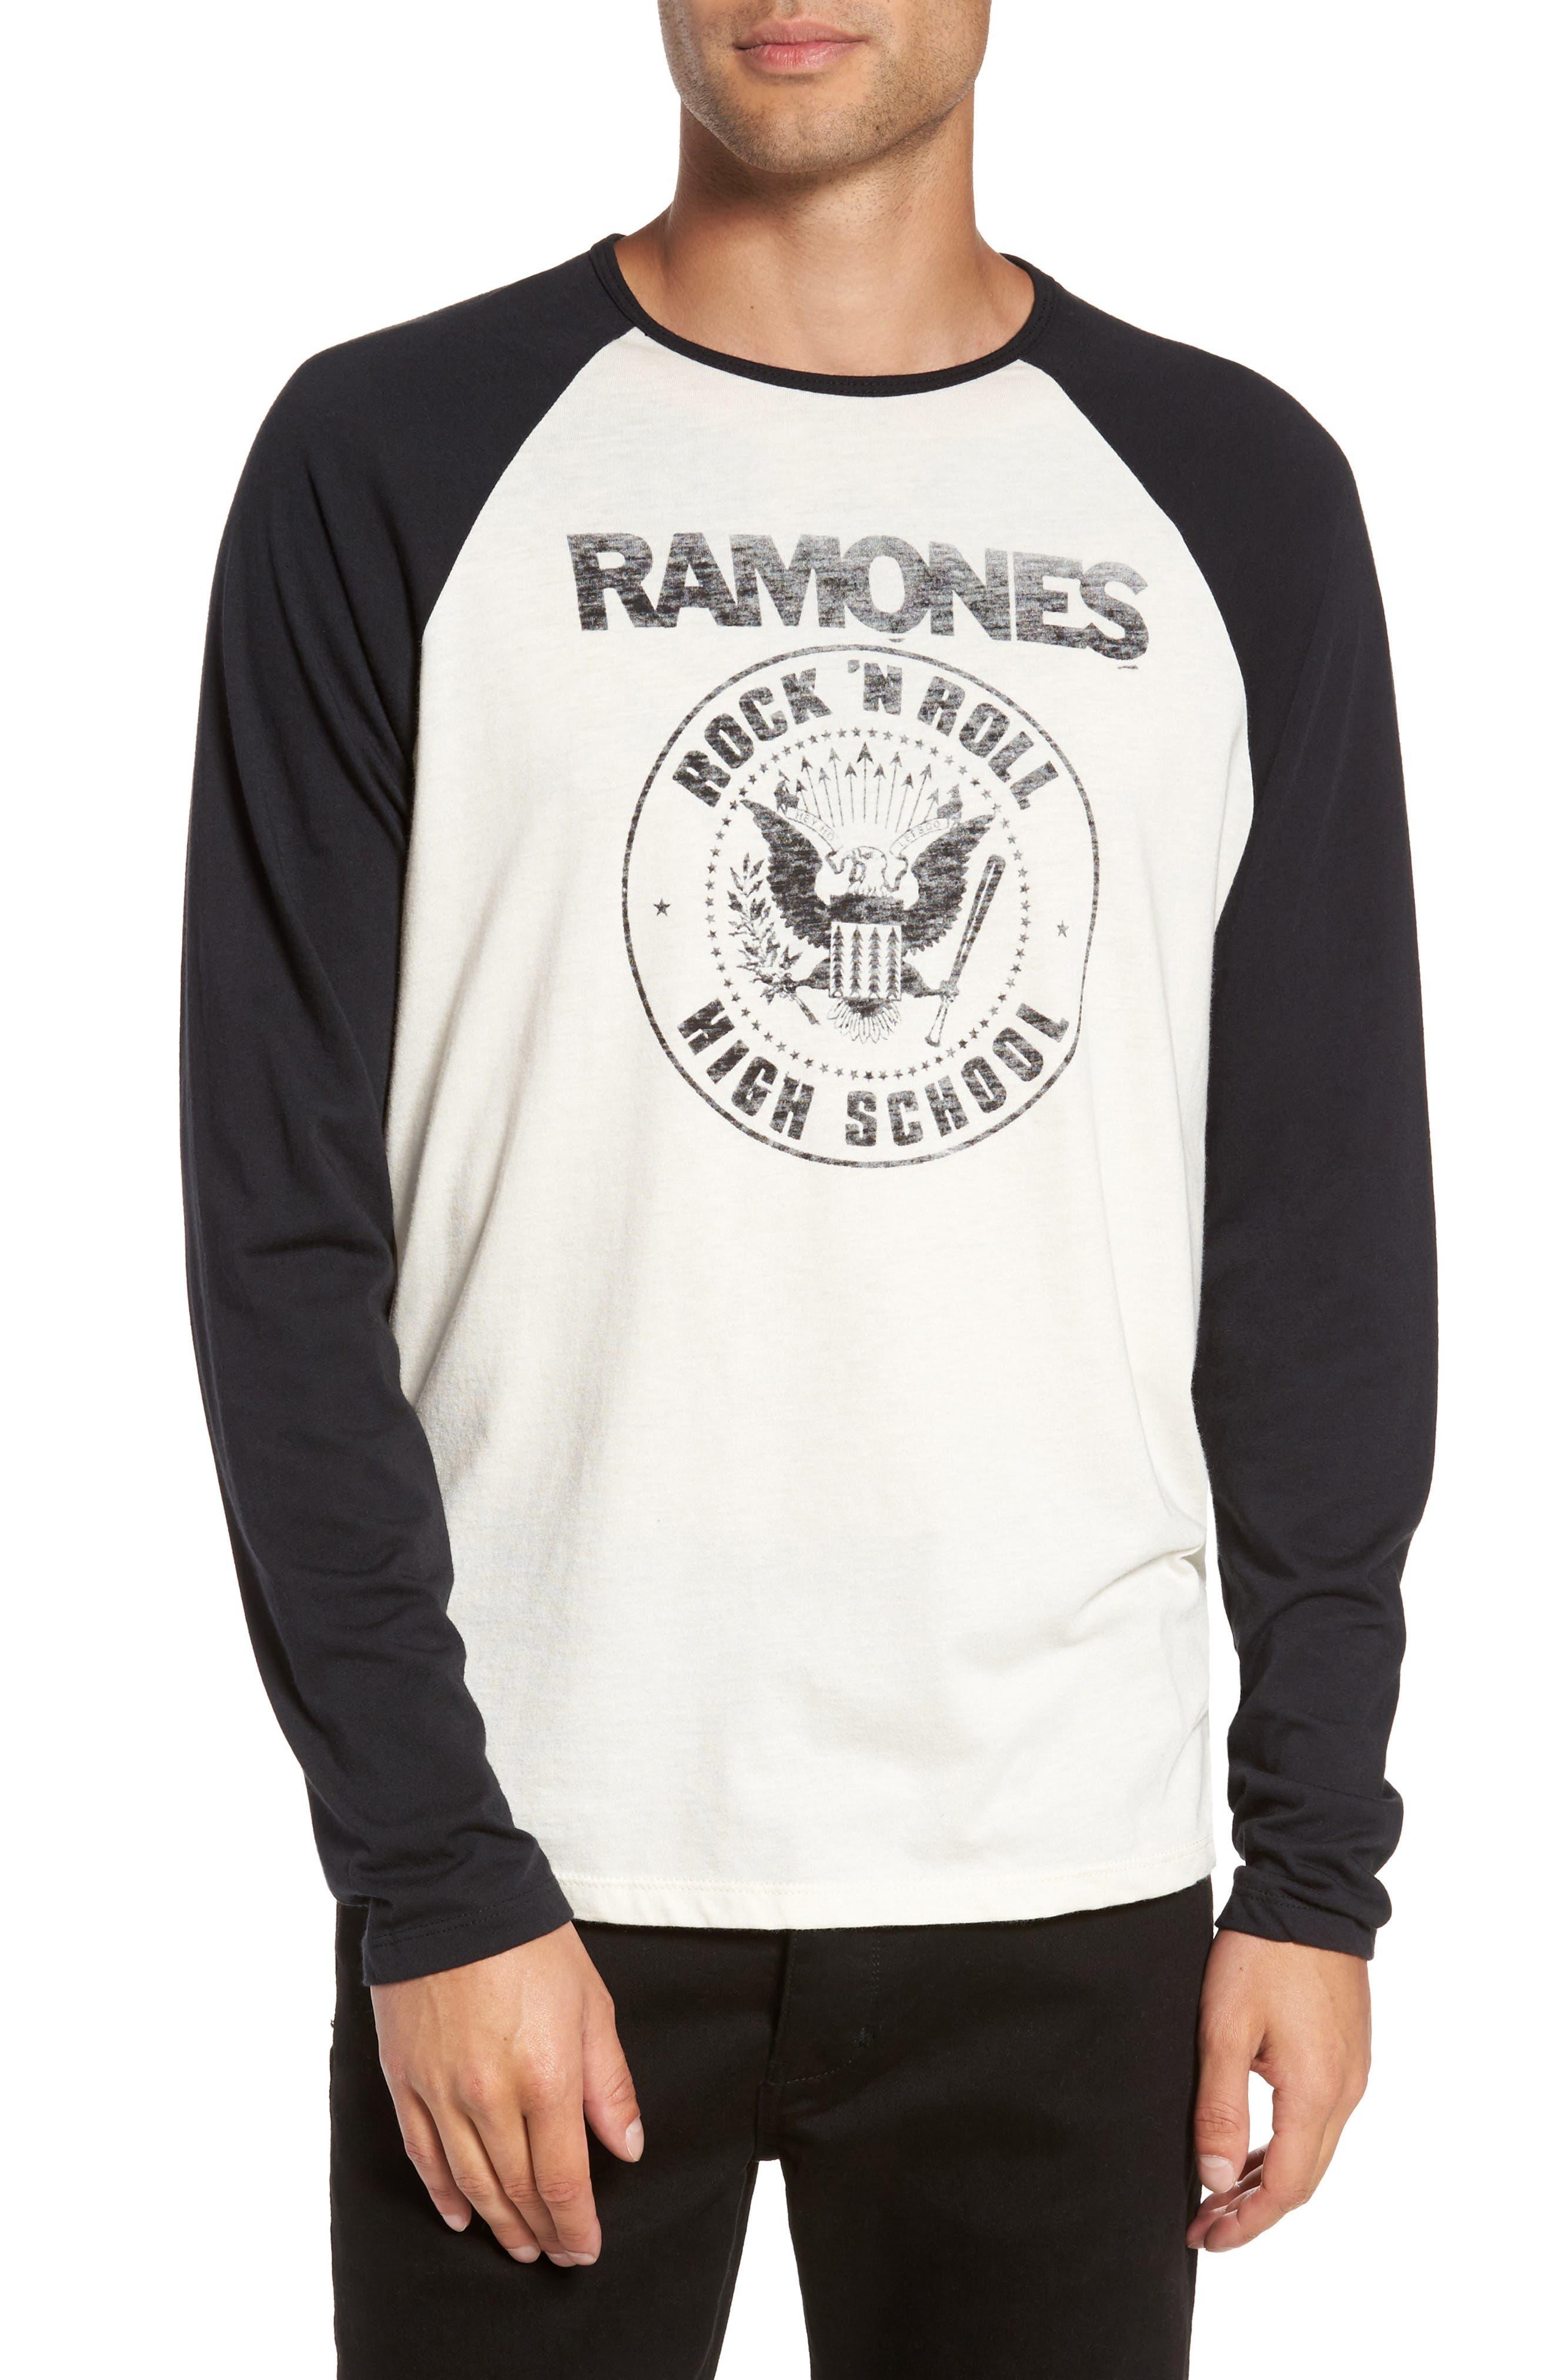 Main Image - John Varvatos Star USA Ramones Rock N Roll High School Graphic T-Shirt